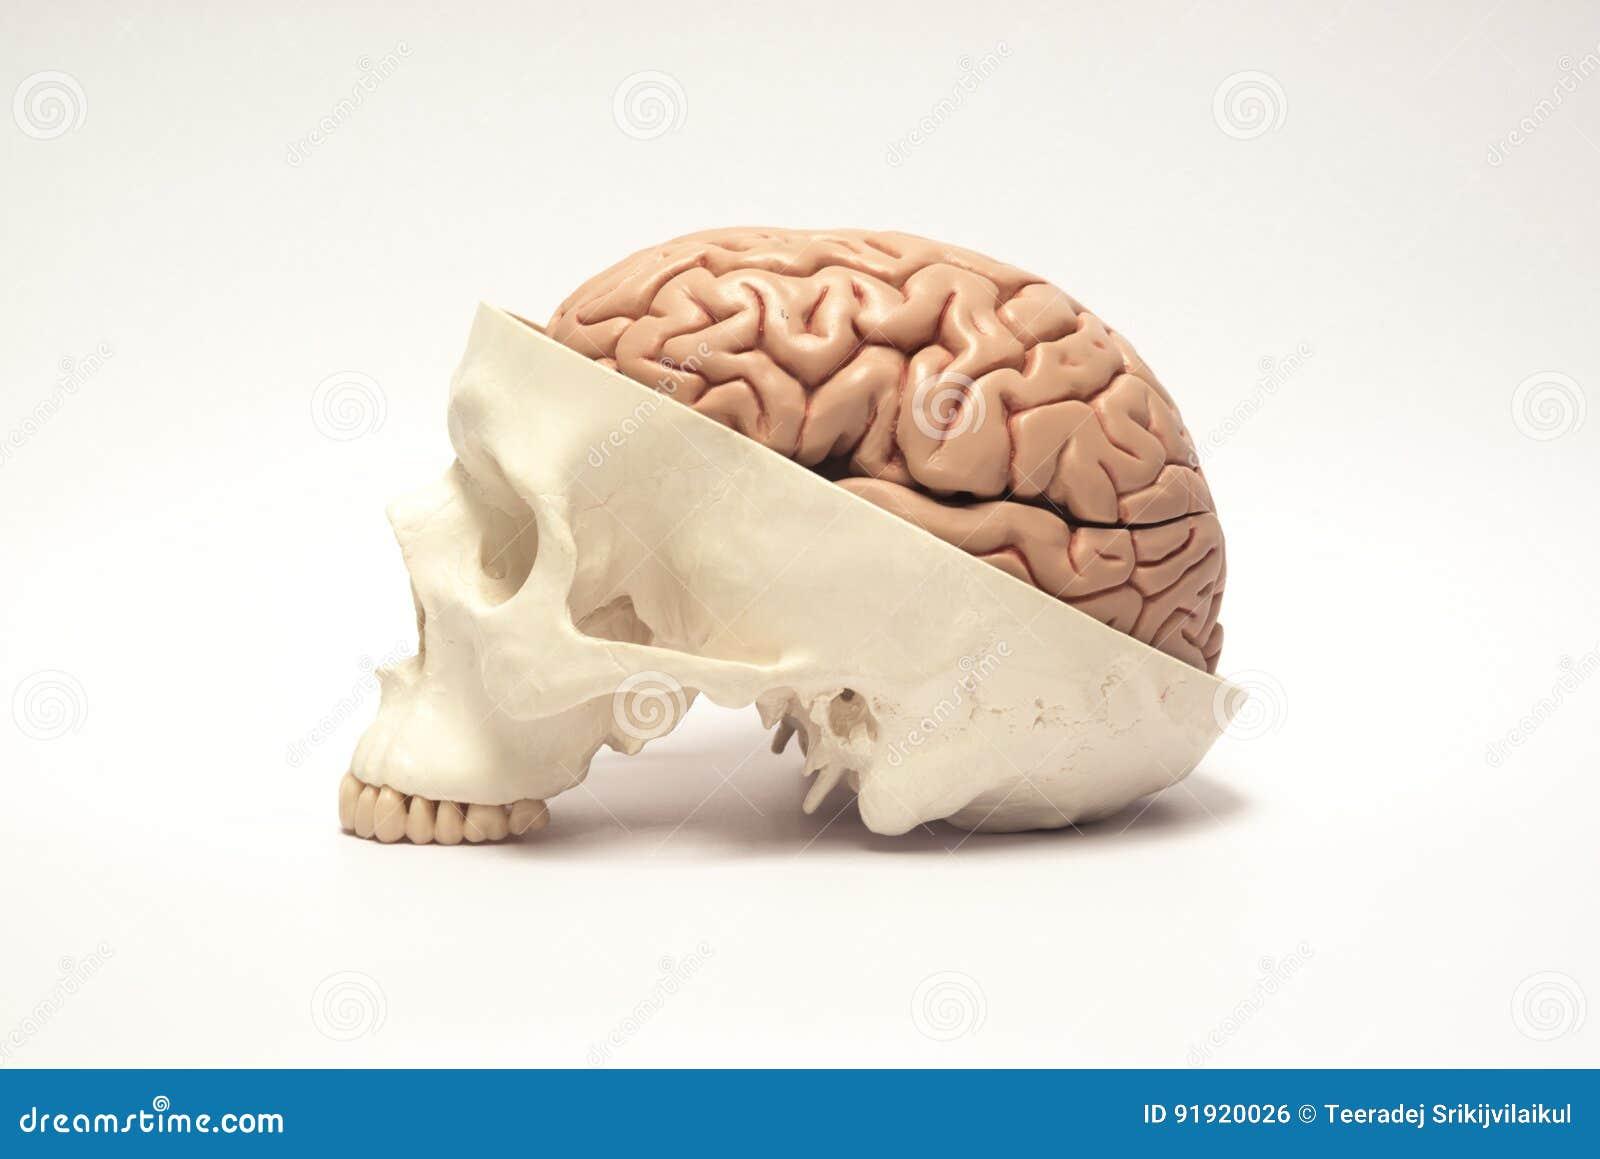 Modelo artificial do cérebro humano e do crânio